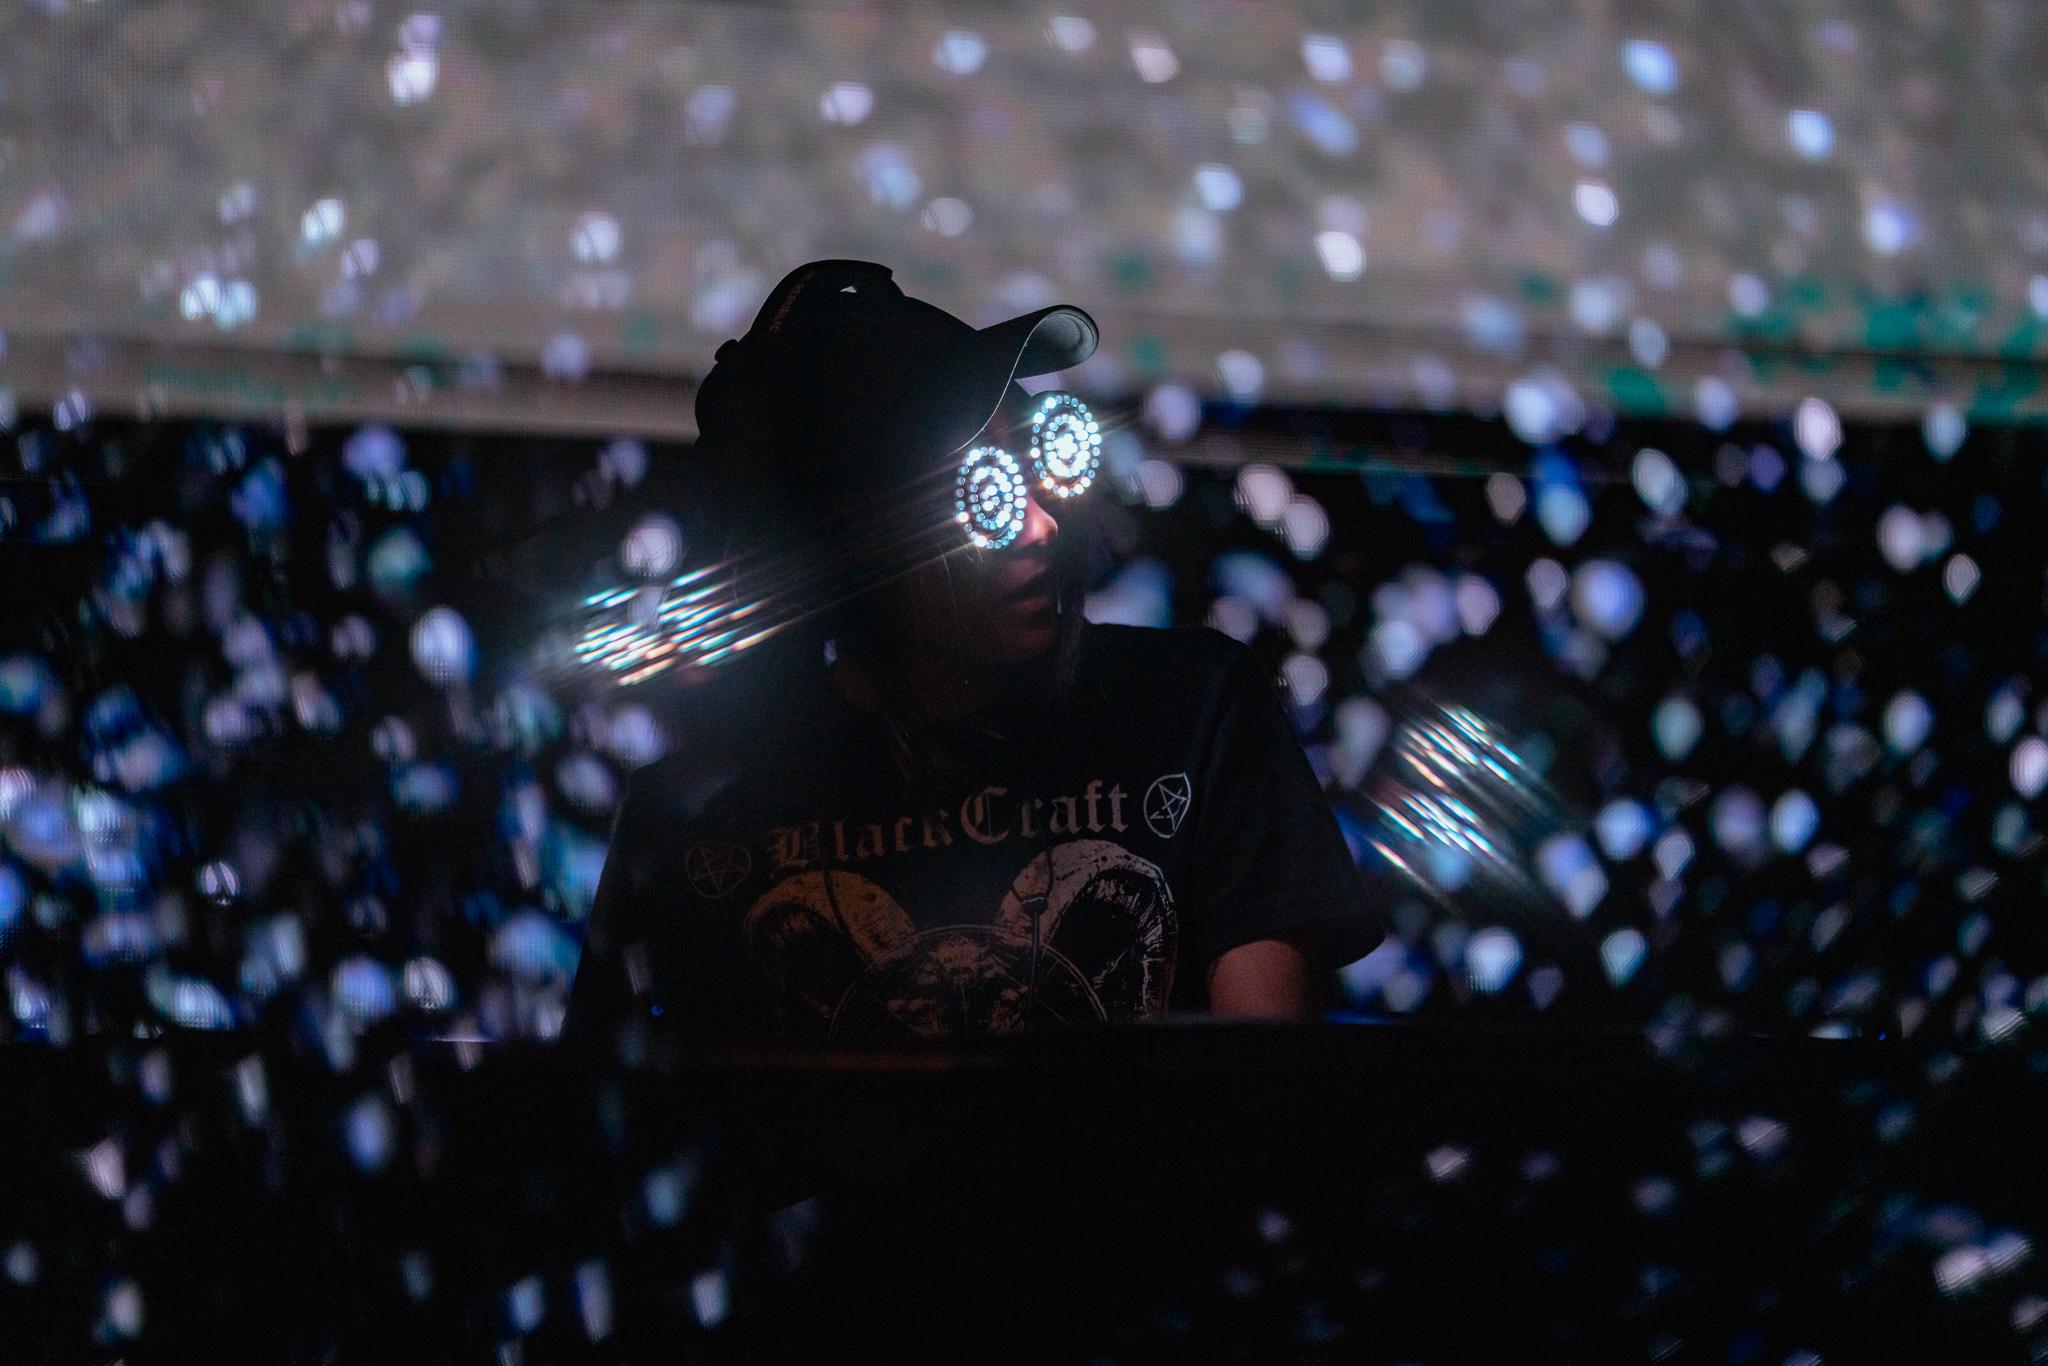 Rezz_NeonDesert2019_KirbyGladstein-08875.jpg